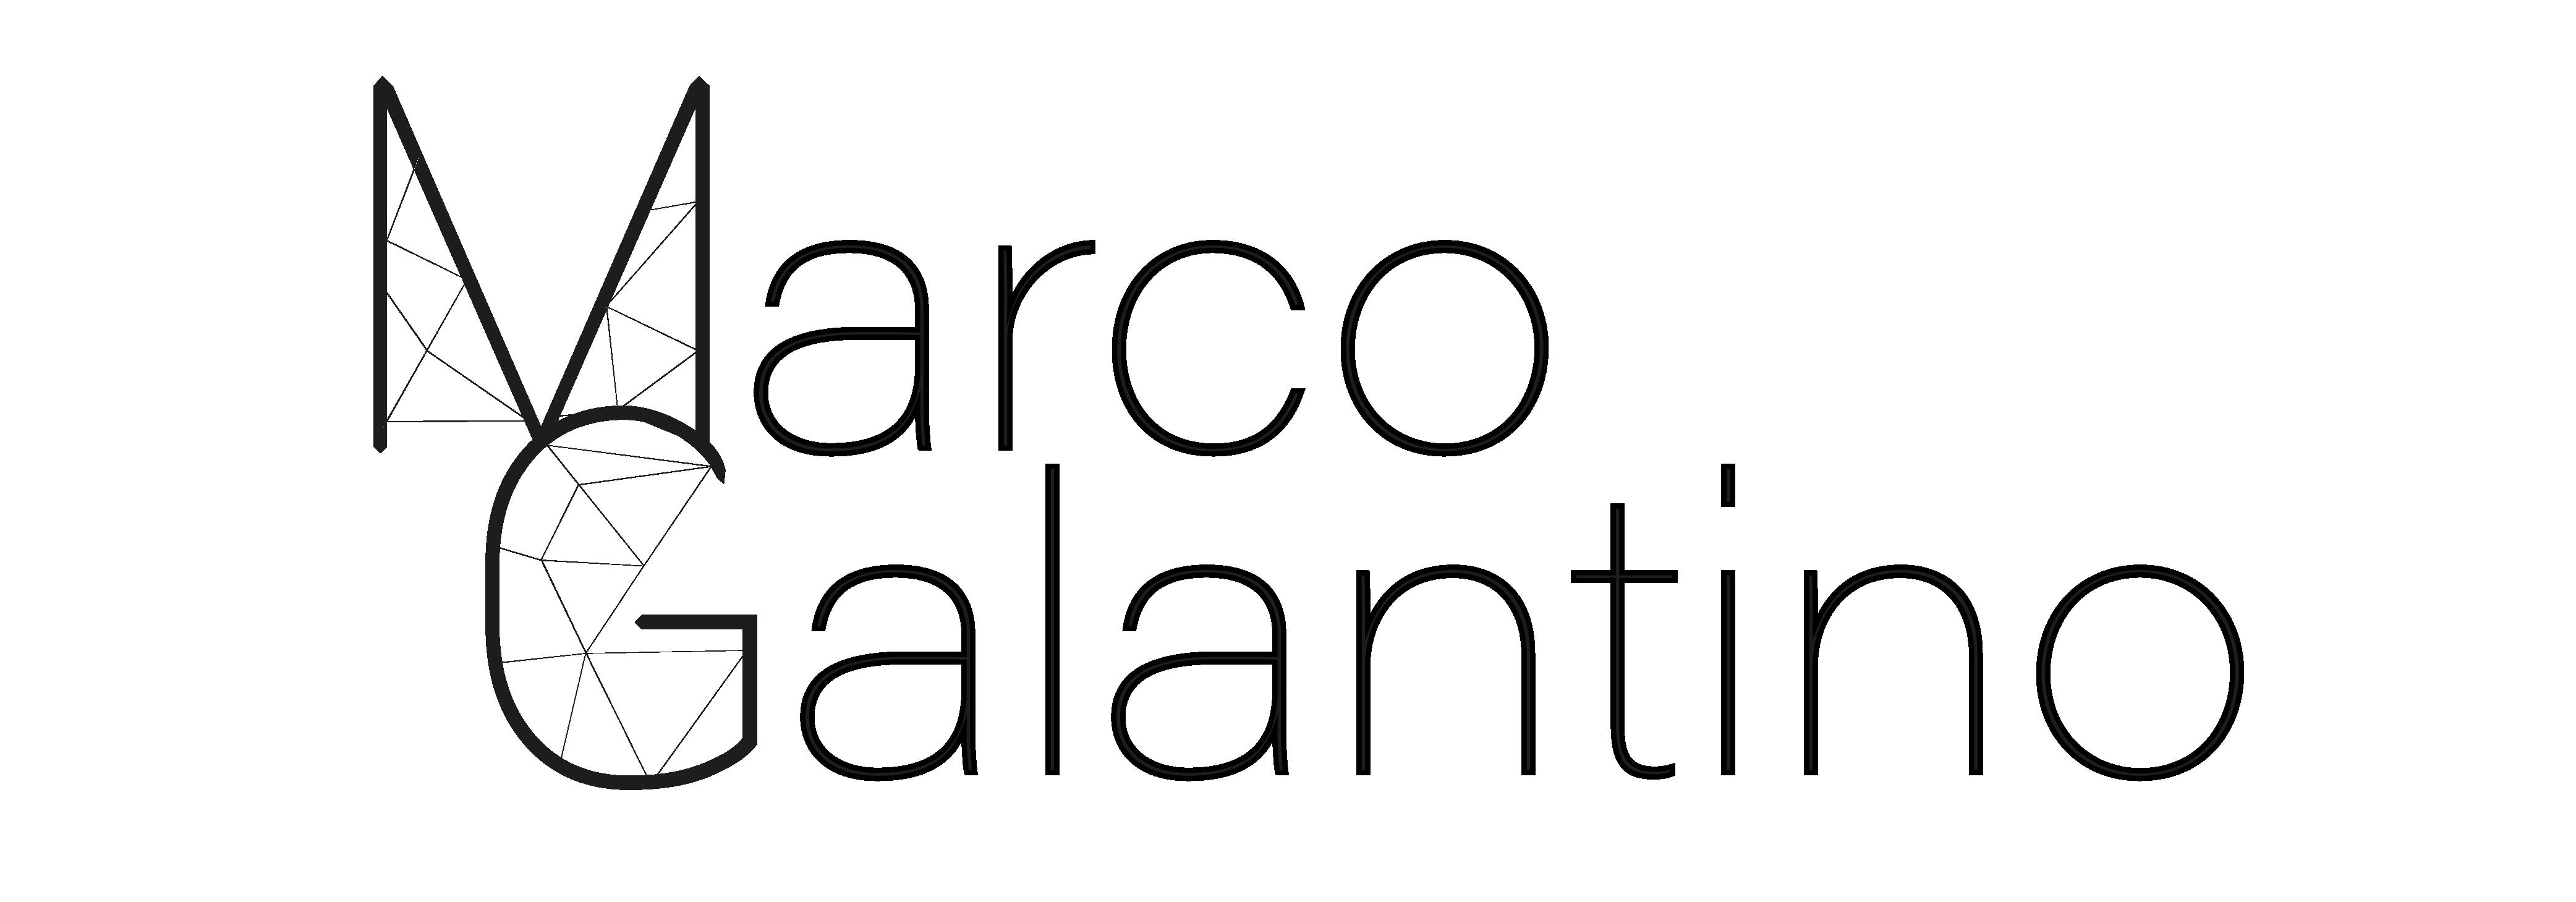 Marco Galantino